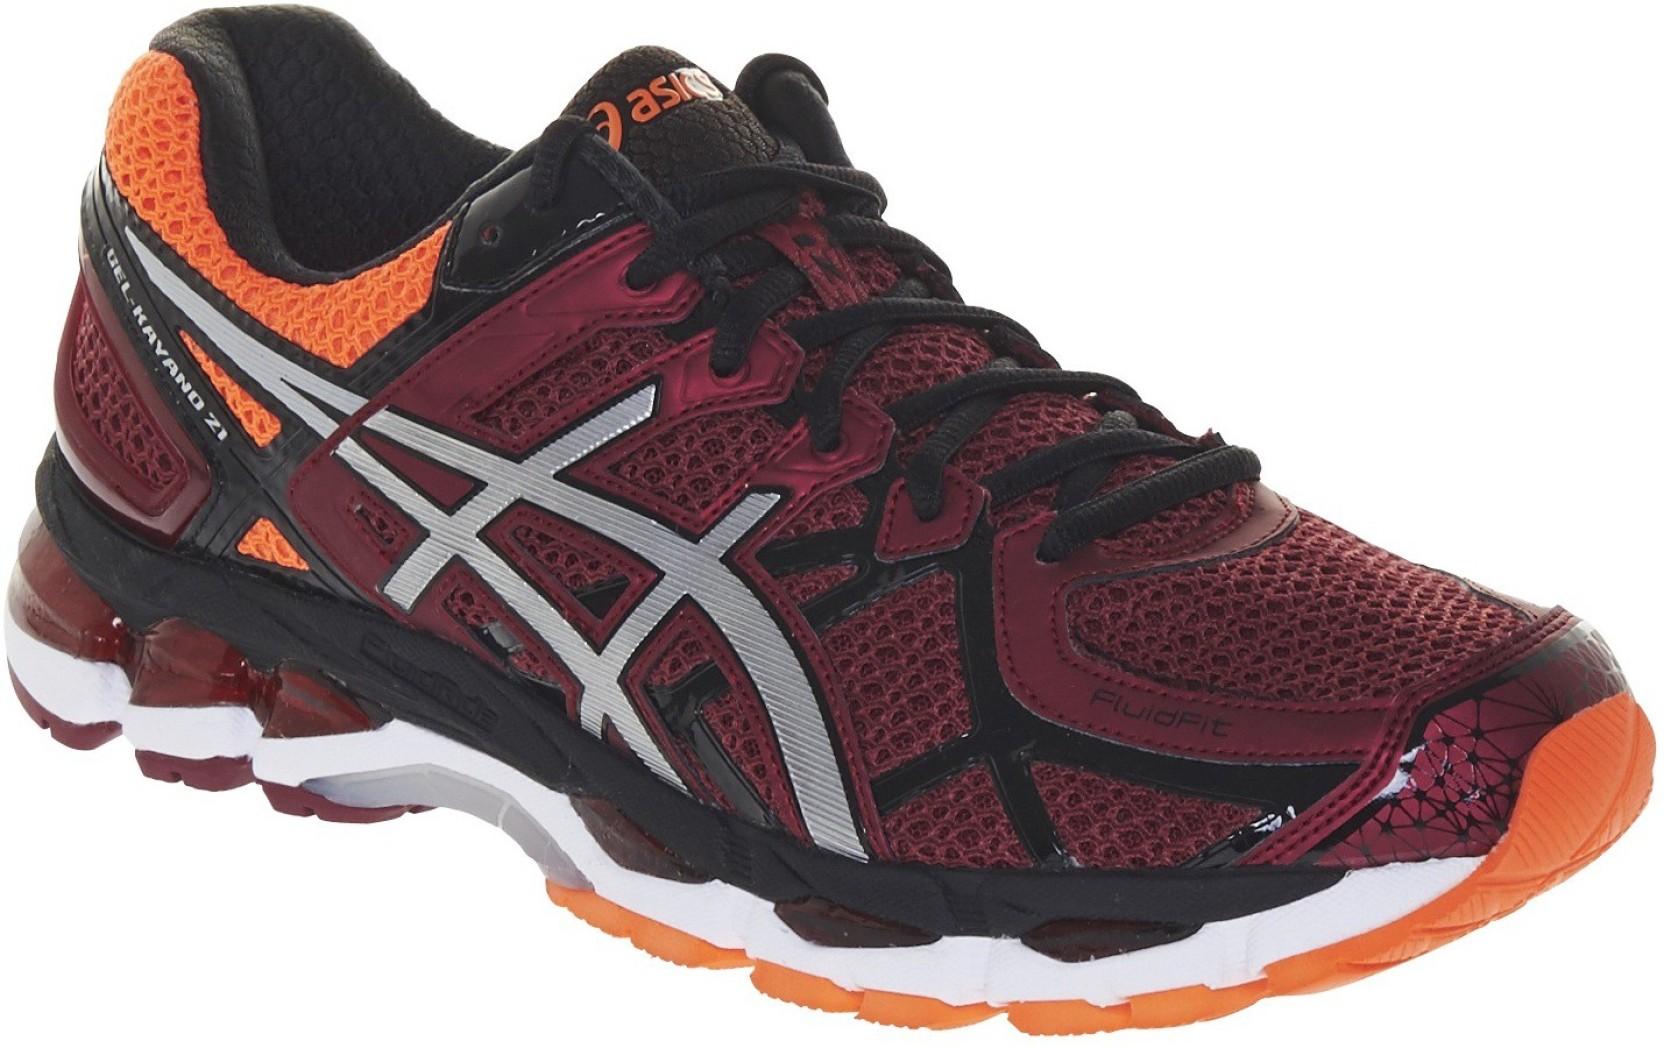 online store 1bc92 4a629 Asics Gel-Kayano 21 Men Running Shoes For Men (Maroon, Silver, Orange)